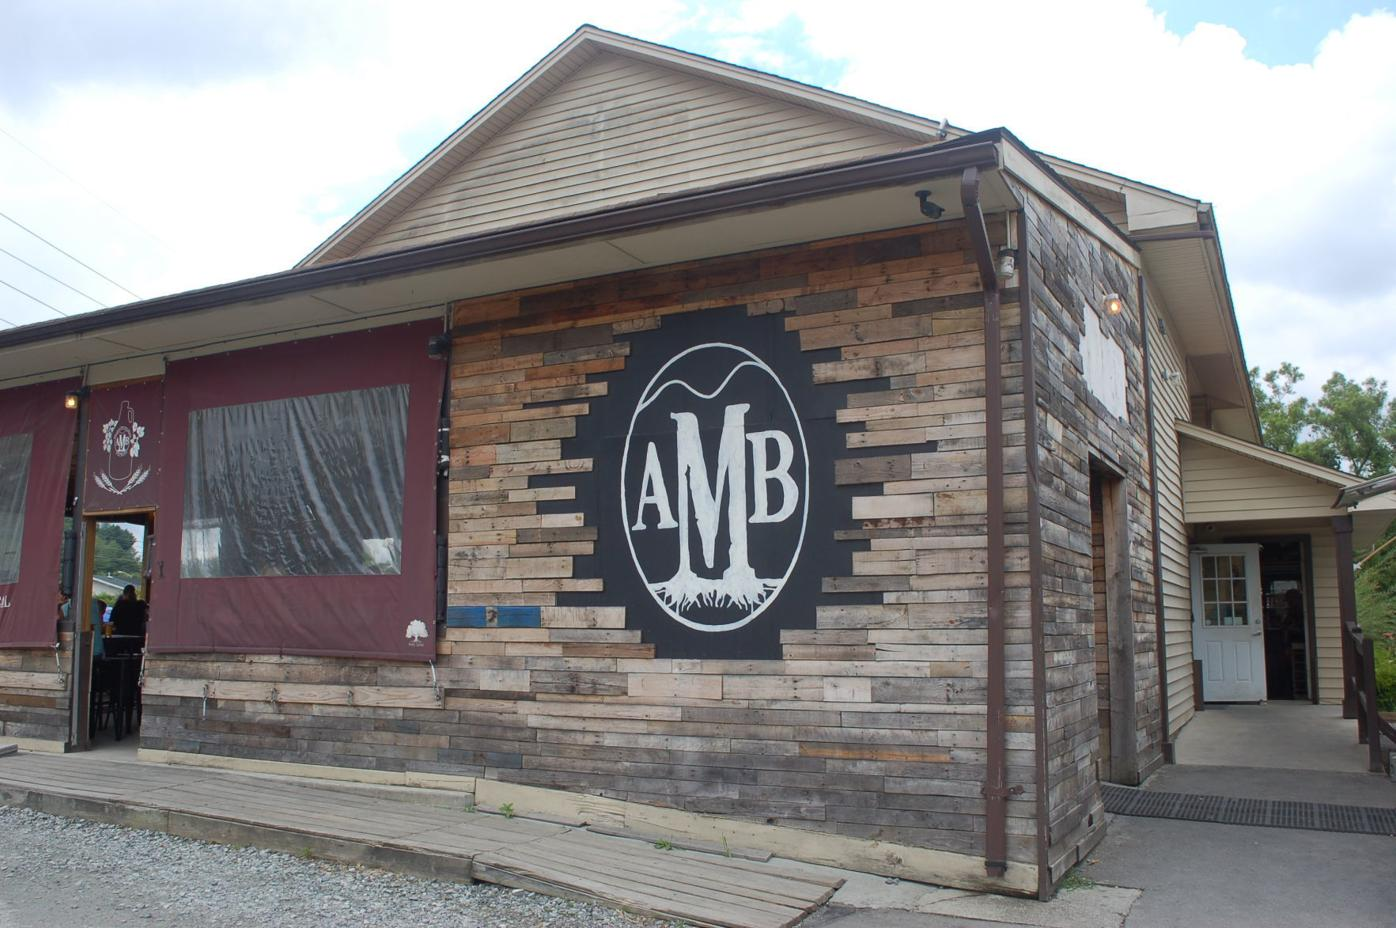 Appalachian Mountain Brewery's home base